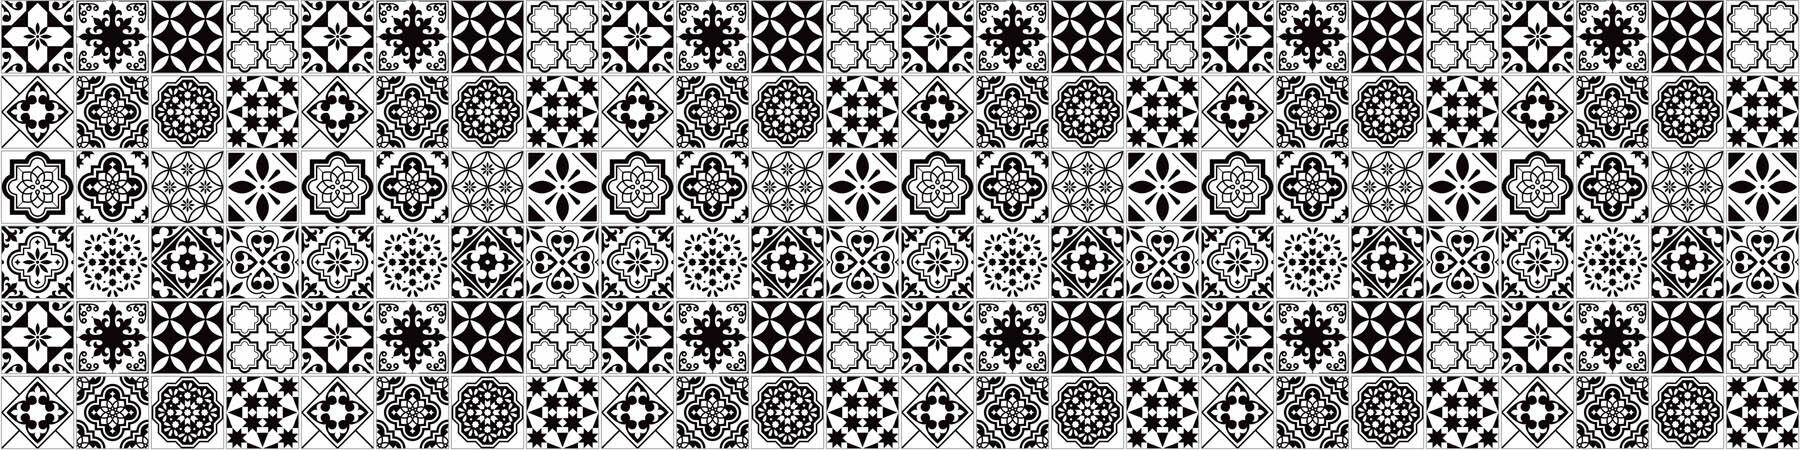 PlateART Küchenrückwand mit Motiv Kacheln Schwarz Weiß